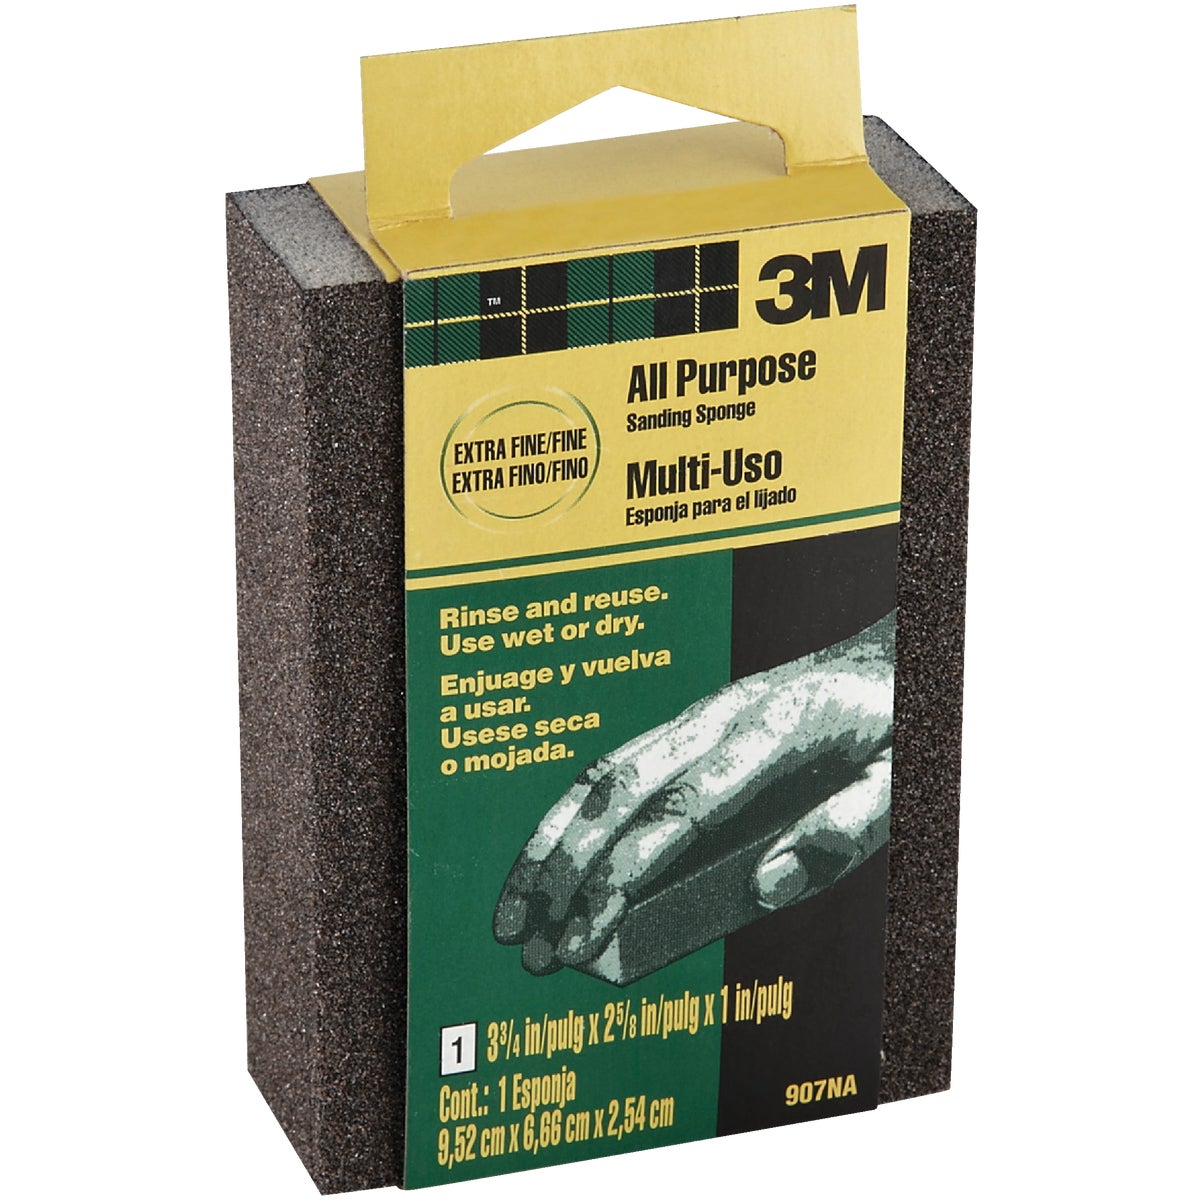 3M All-Purpose 2-5/8 In. x 3-3/4 In. x 1 In. Extra Fine/Fine Sanding Sponge